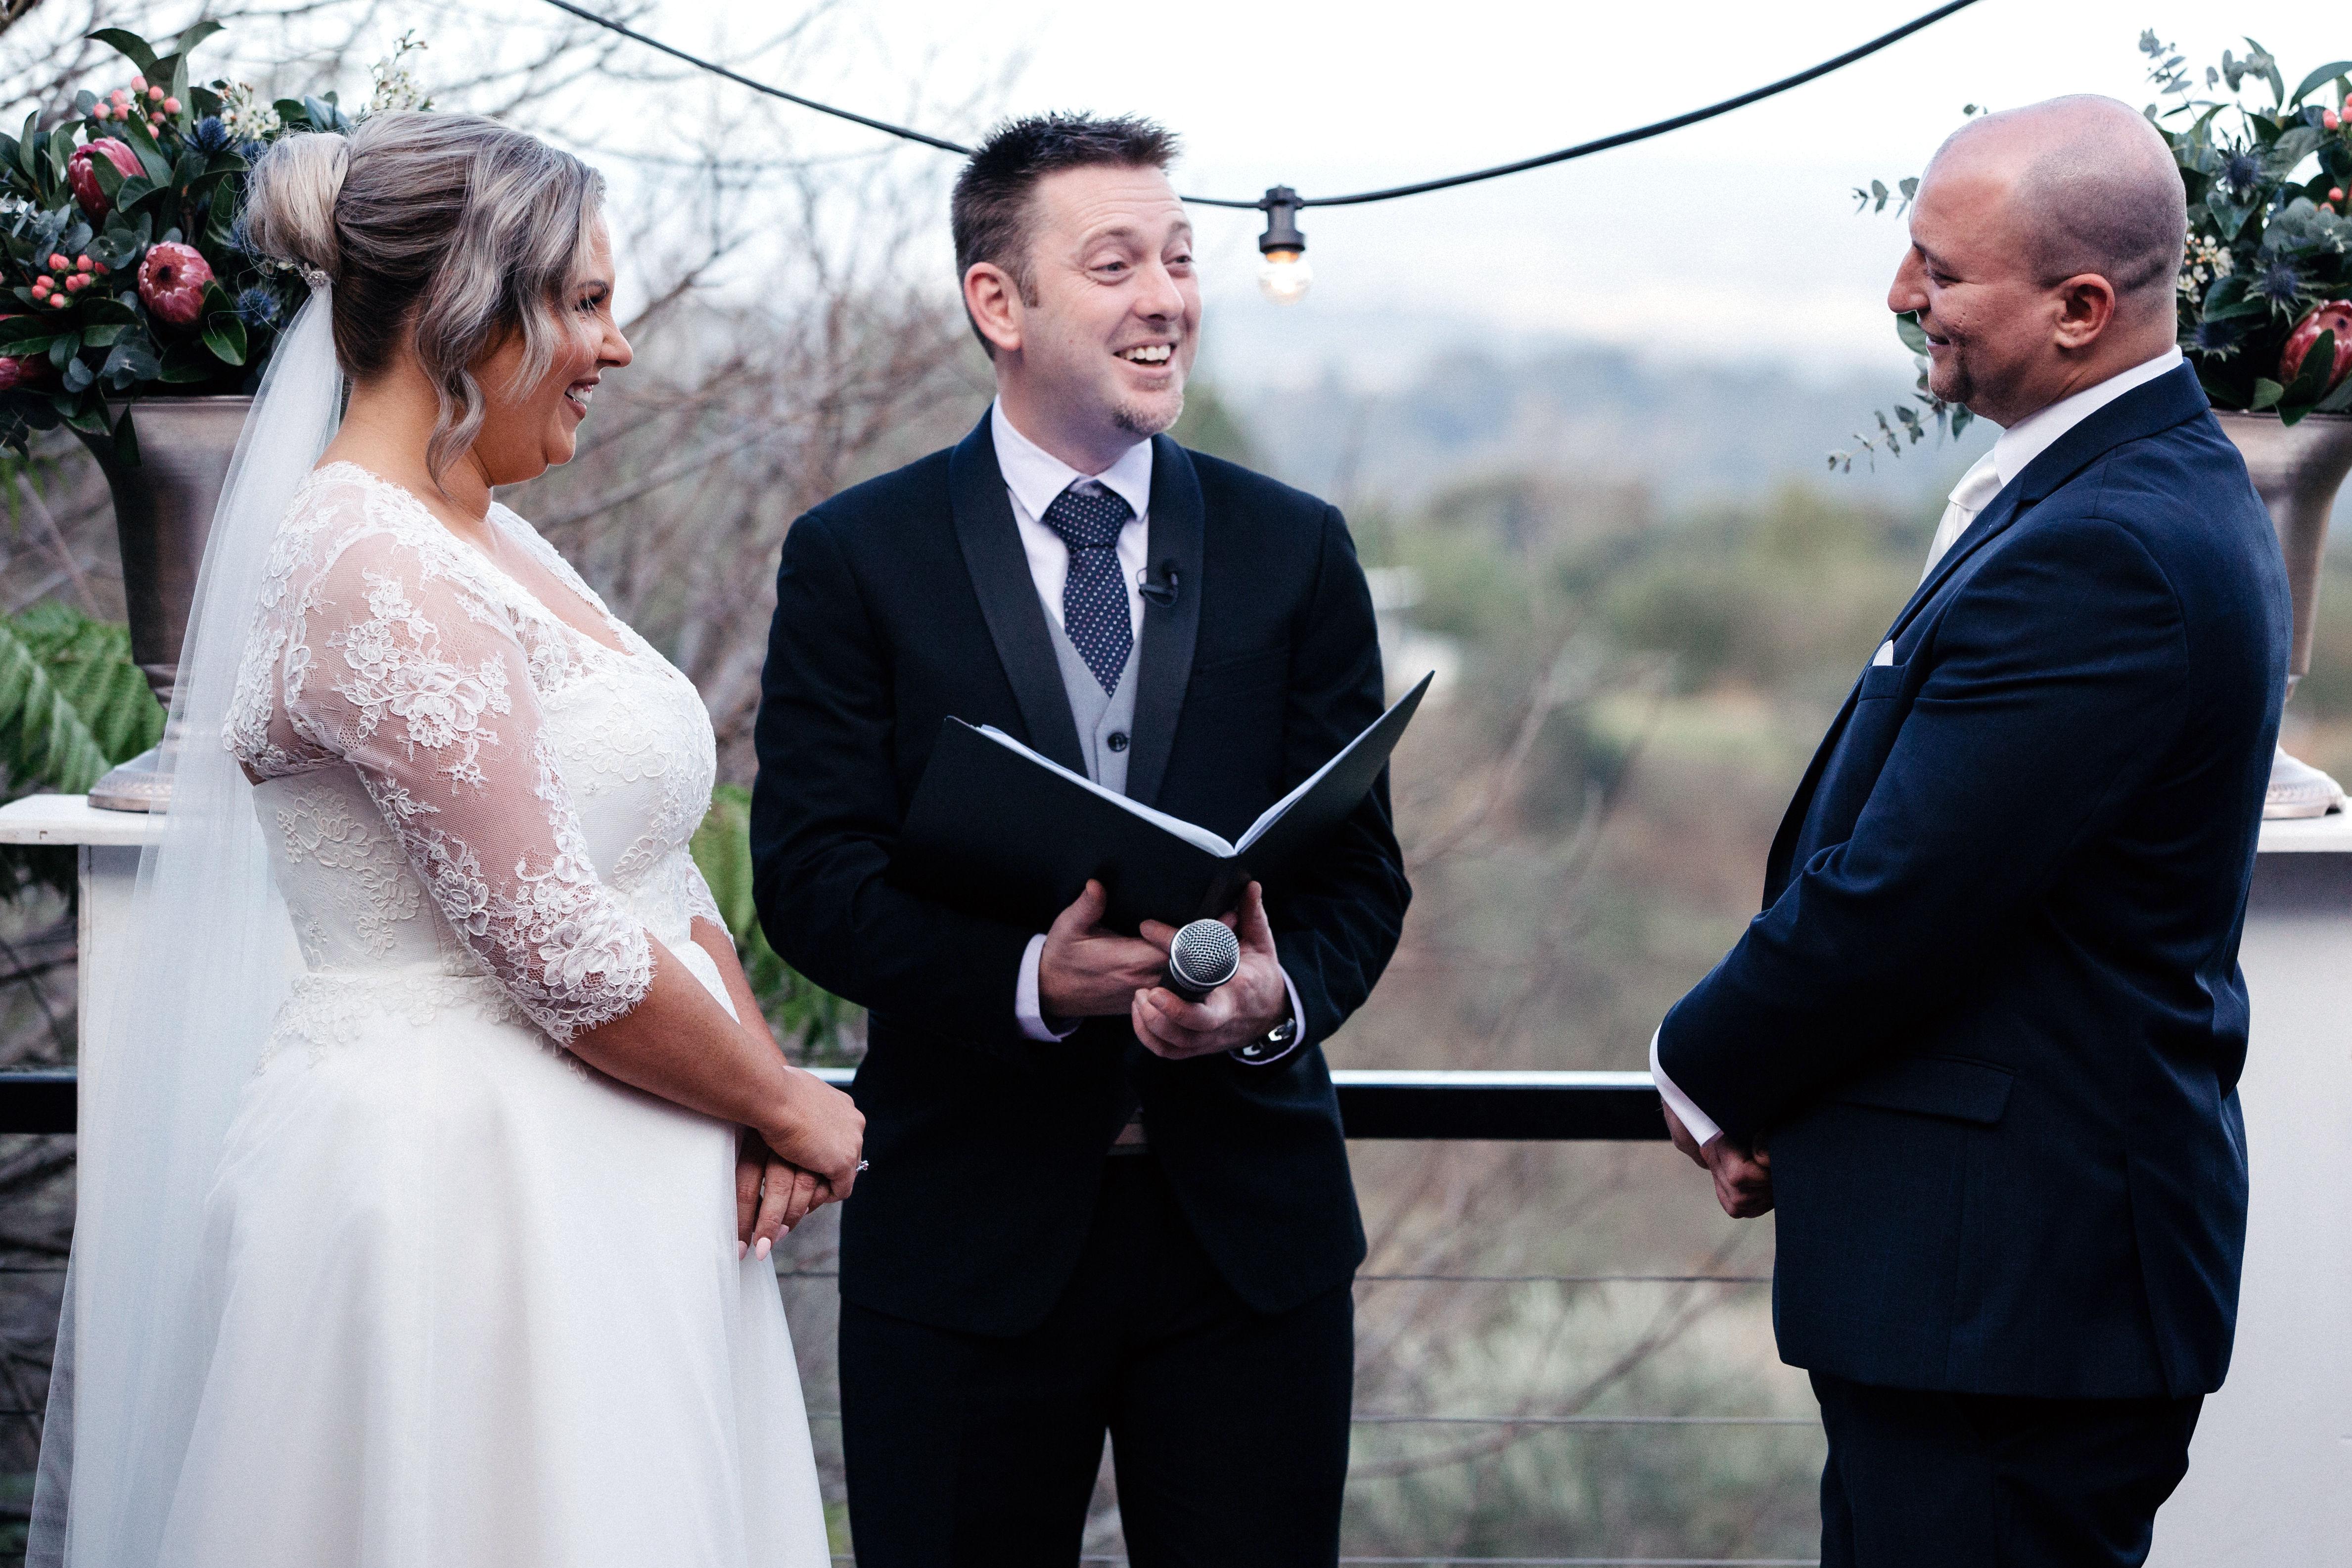 Marriage Celebrant, Sydney Marriage Celebrant, Wedding Celebrant, The Hills Marriage Celebrant, Registered Marriage Celebrant, Fun Ceremony, Wedding Ceremony, Male Celebrant